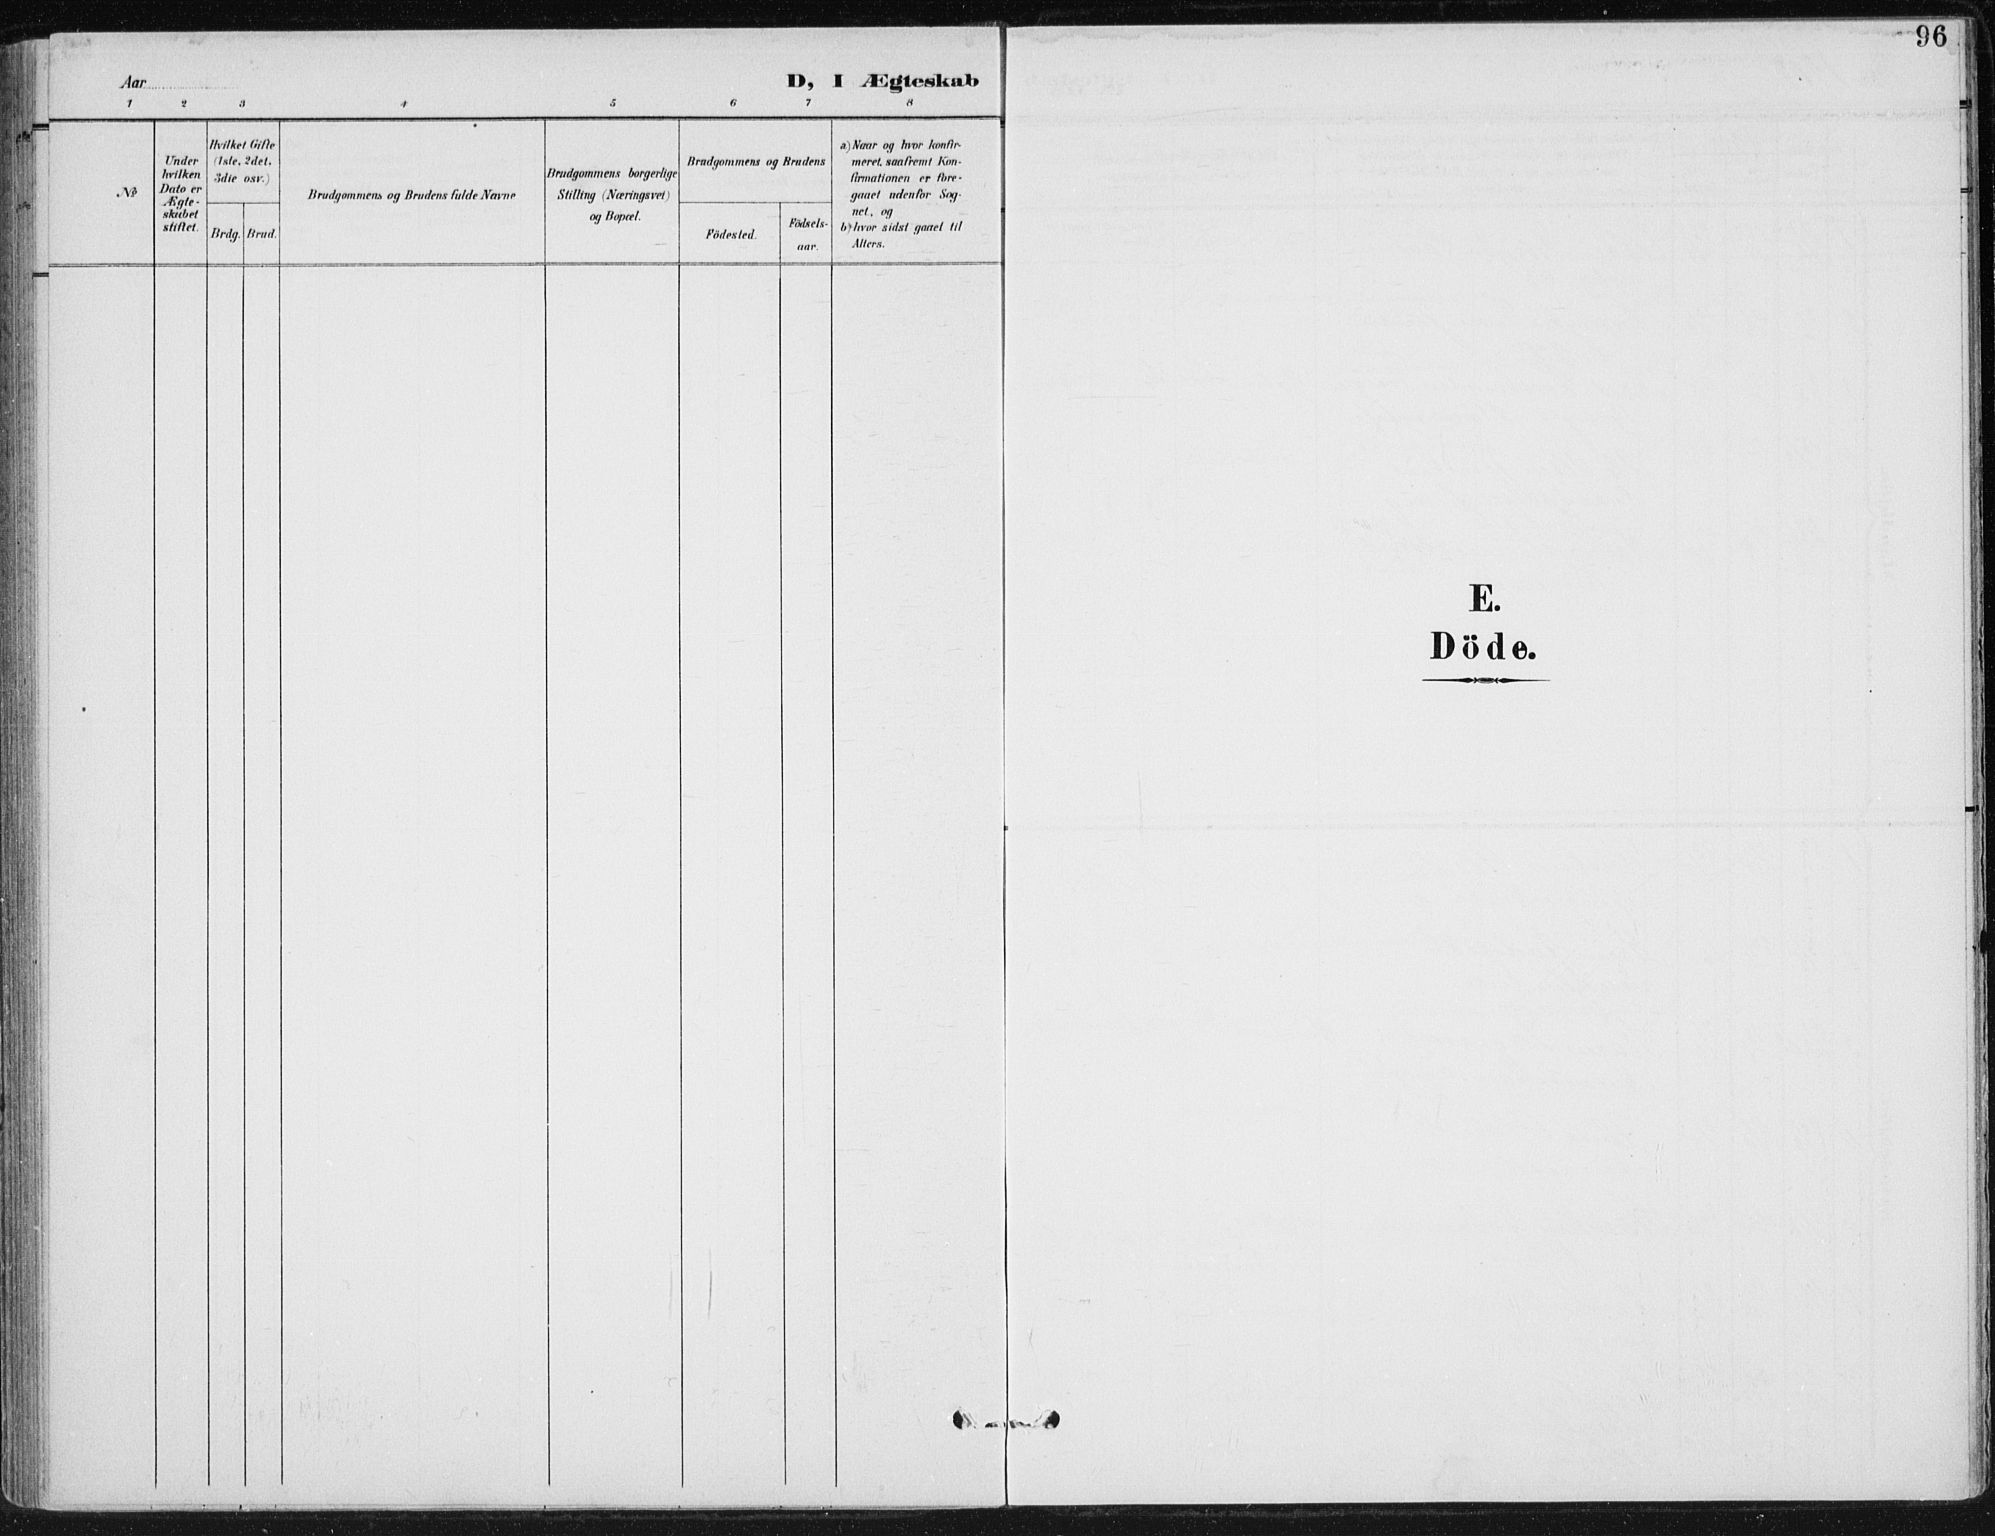 SAH, Østre Gausdal prestekontor, Ministerialbok nr. 5, 1902-1920, s. 96